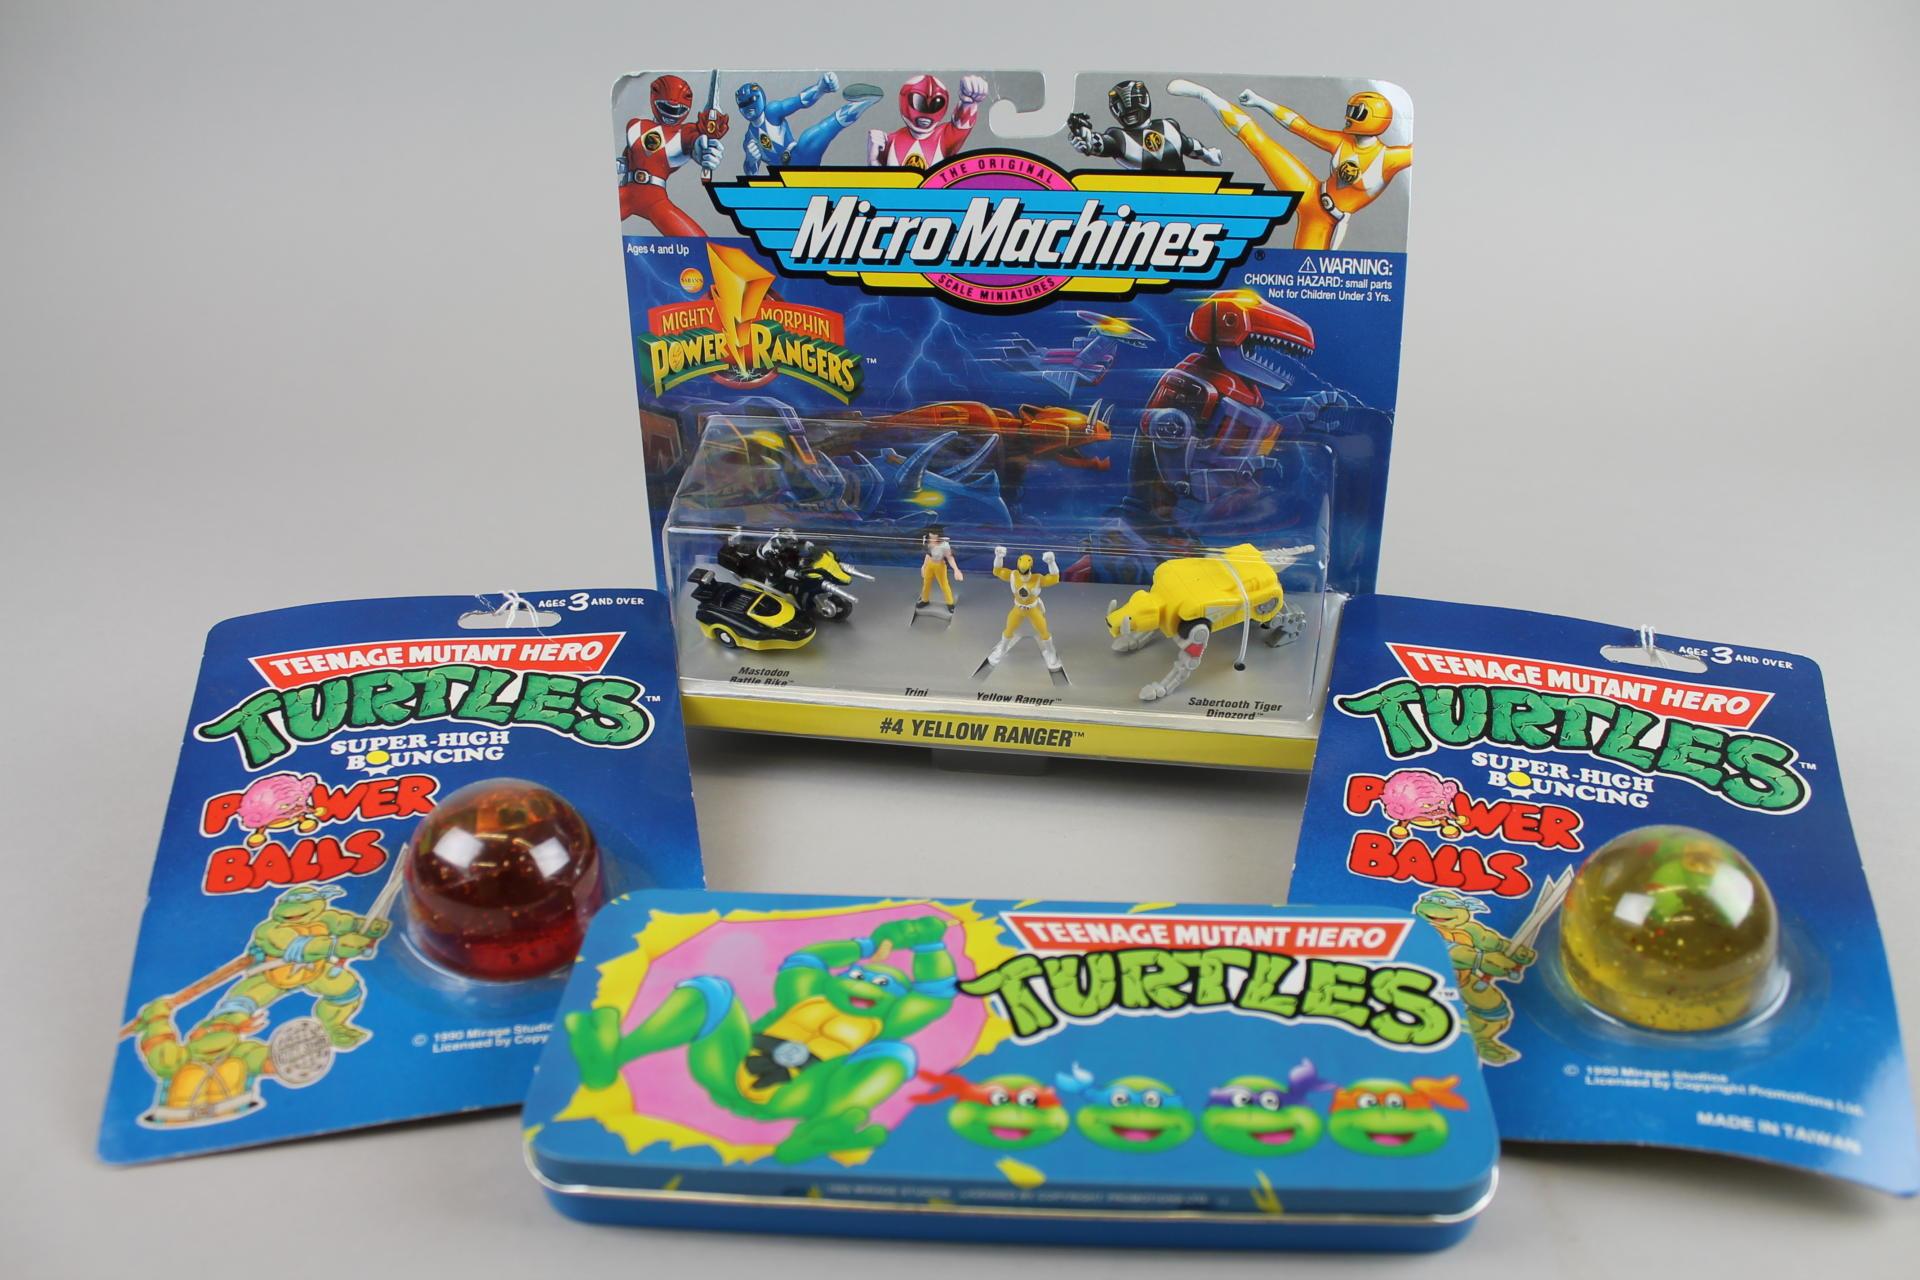 Power Rangers And Teenage Mutant Hero Turtles toys